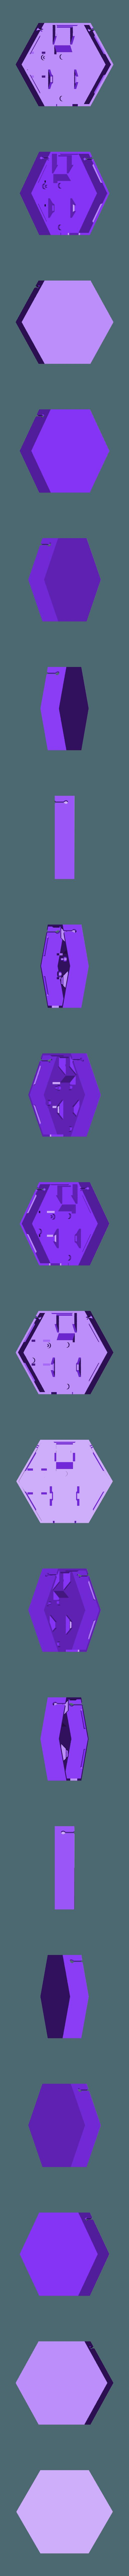 itsy-case.stl Download free STL file NeoPixel LED Heart Necklace • 3D printable model, Adafruit